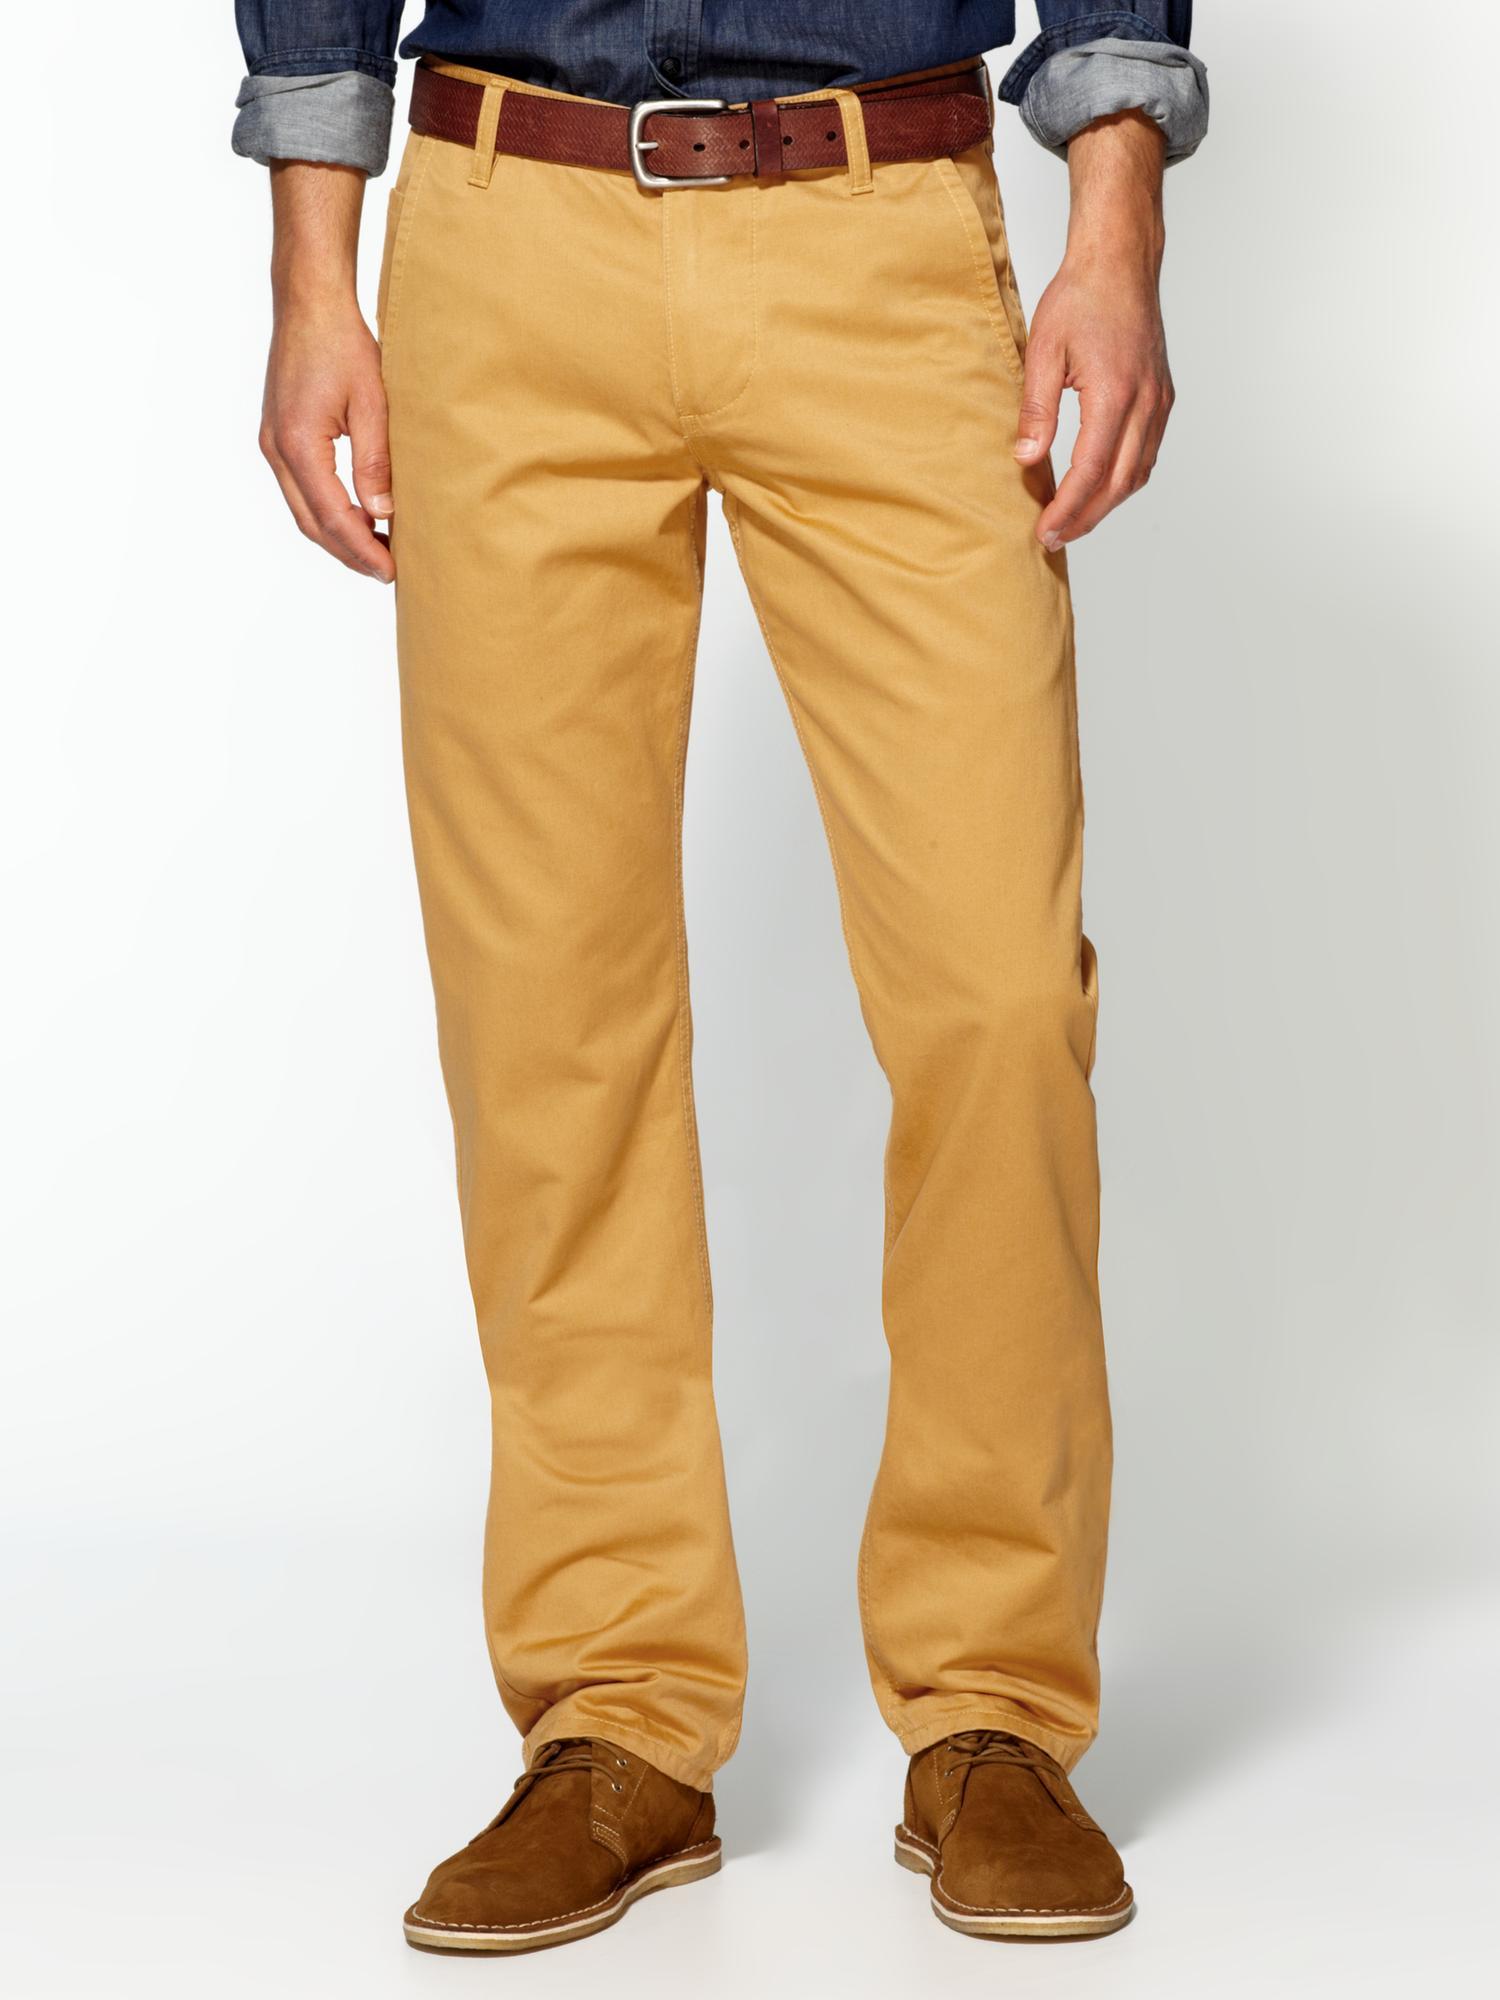 yellow khaki pants - Pi Pants